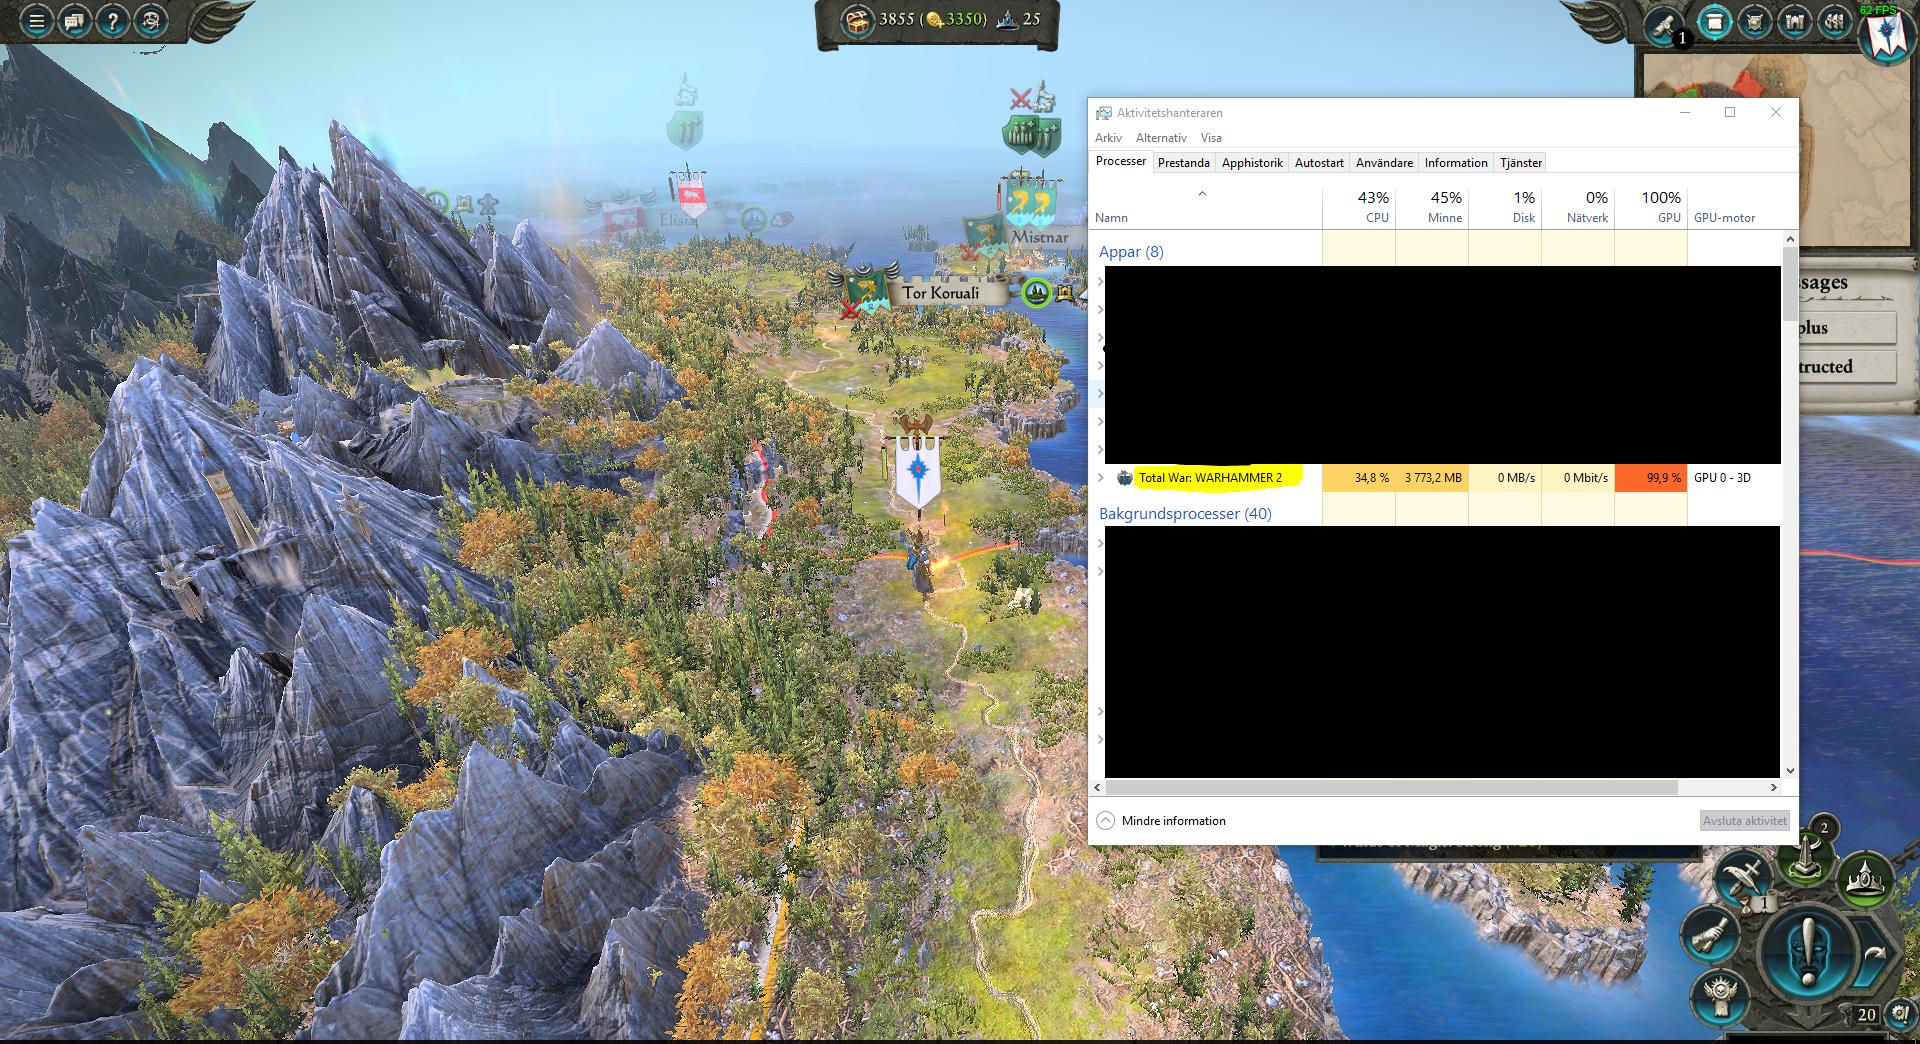 100% GPU usage on Nvidia Geforce GTX 970 — Total War Forums